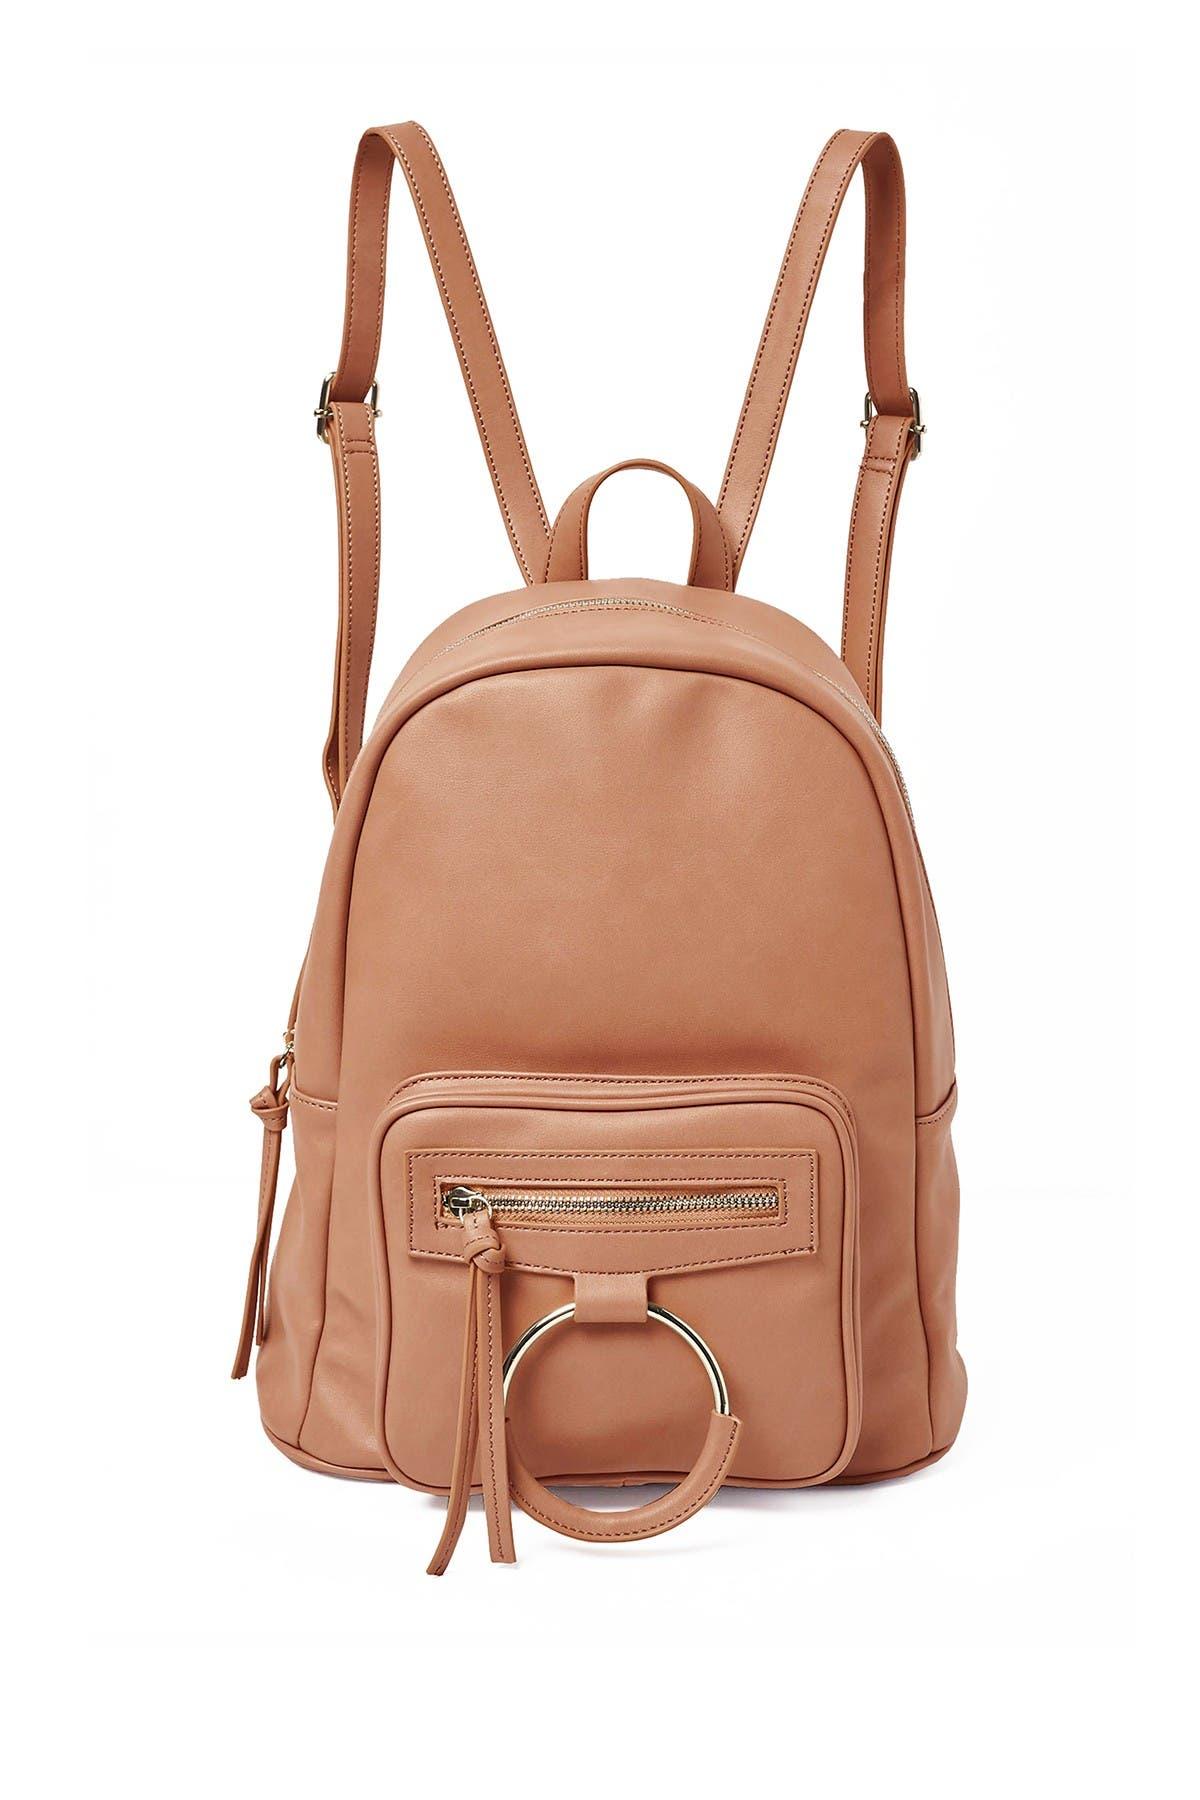 Urban Originals Sublime Vegan Leather Backpack In Nude